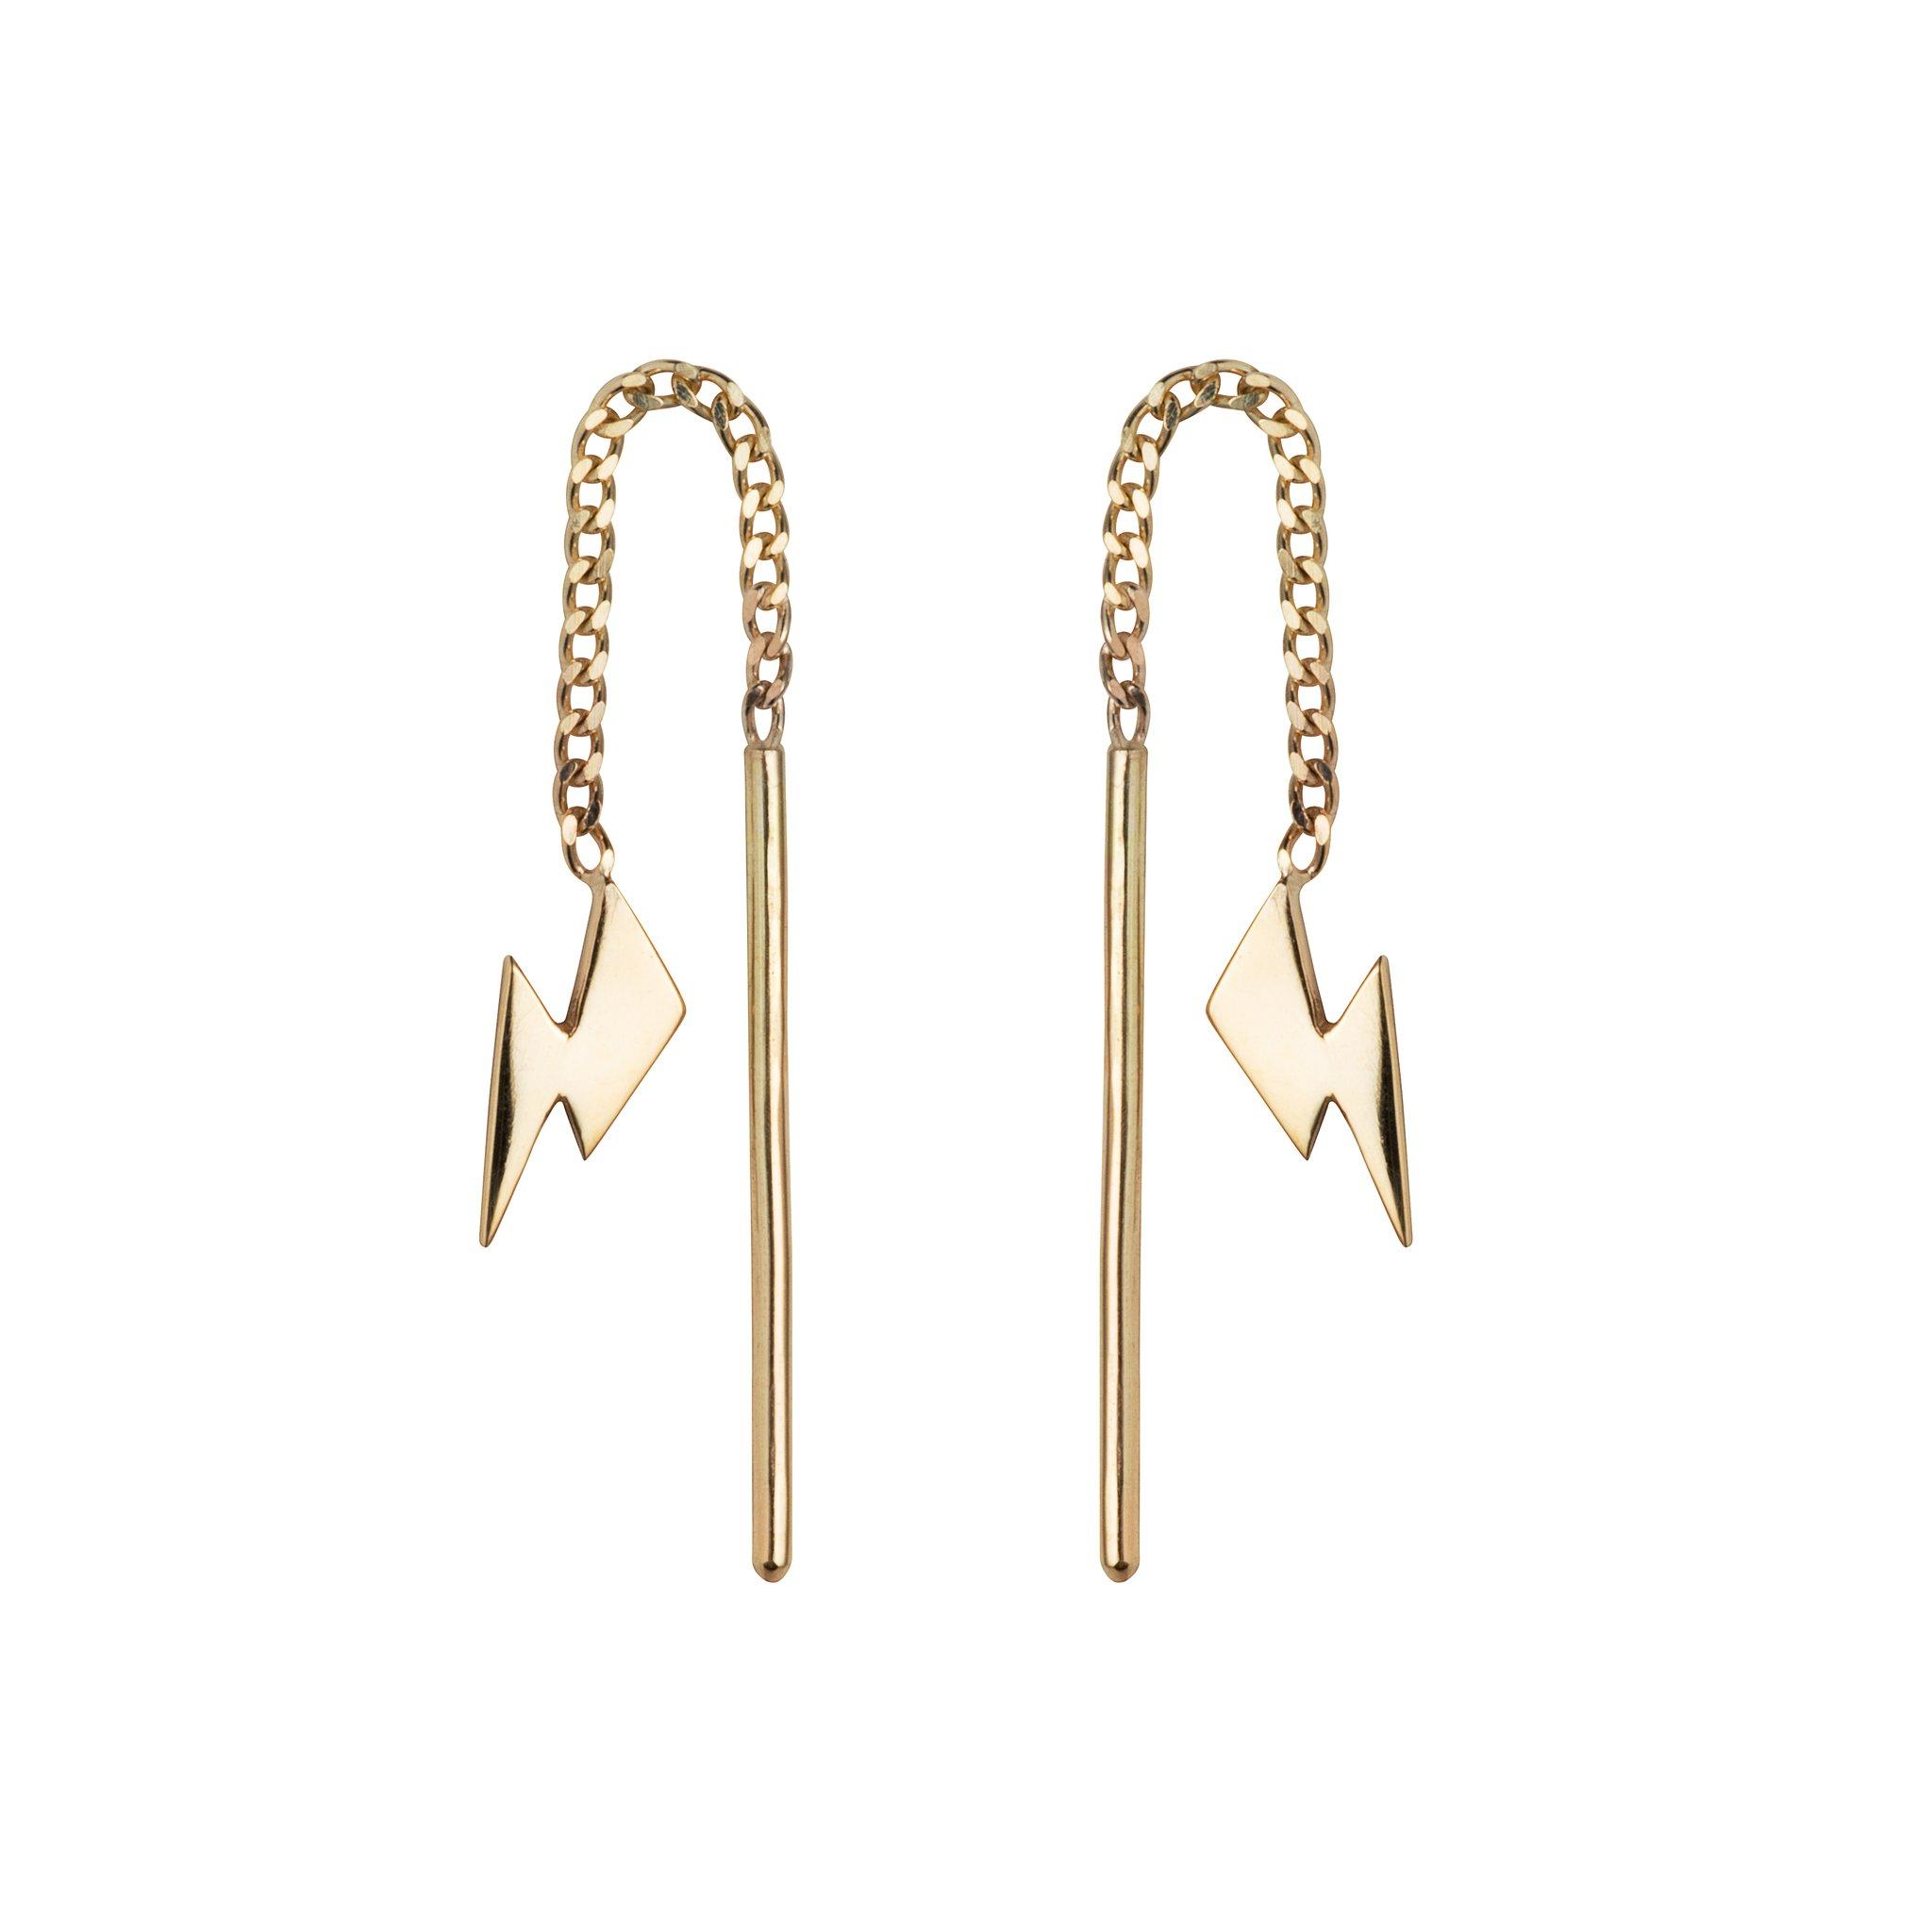 bowie-flash-threaders-gold-PAIR